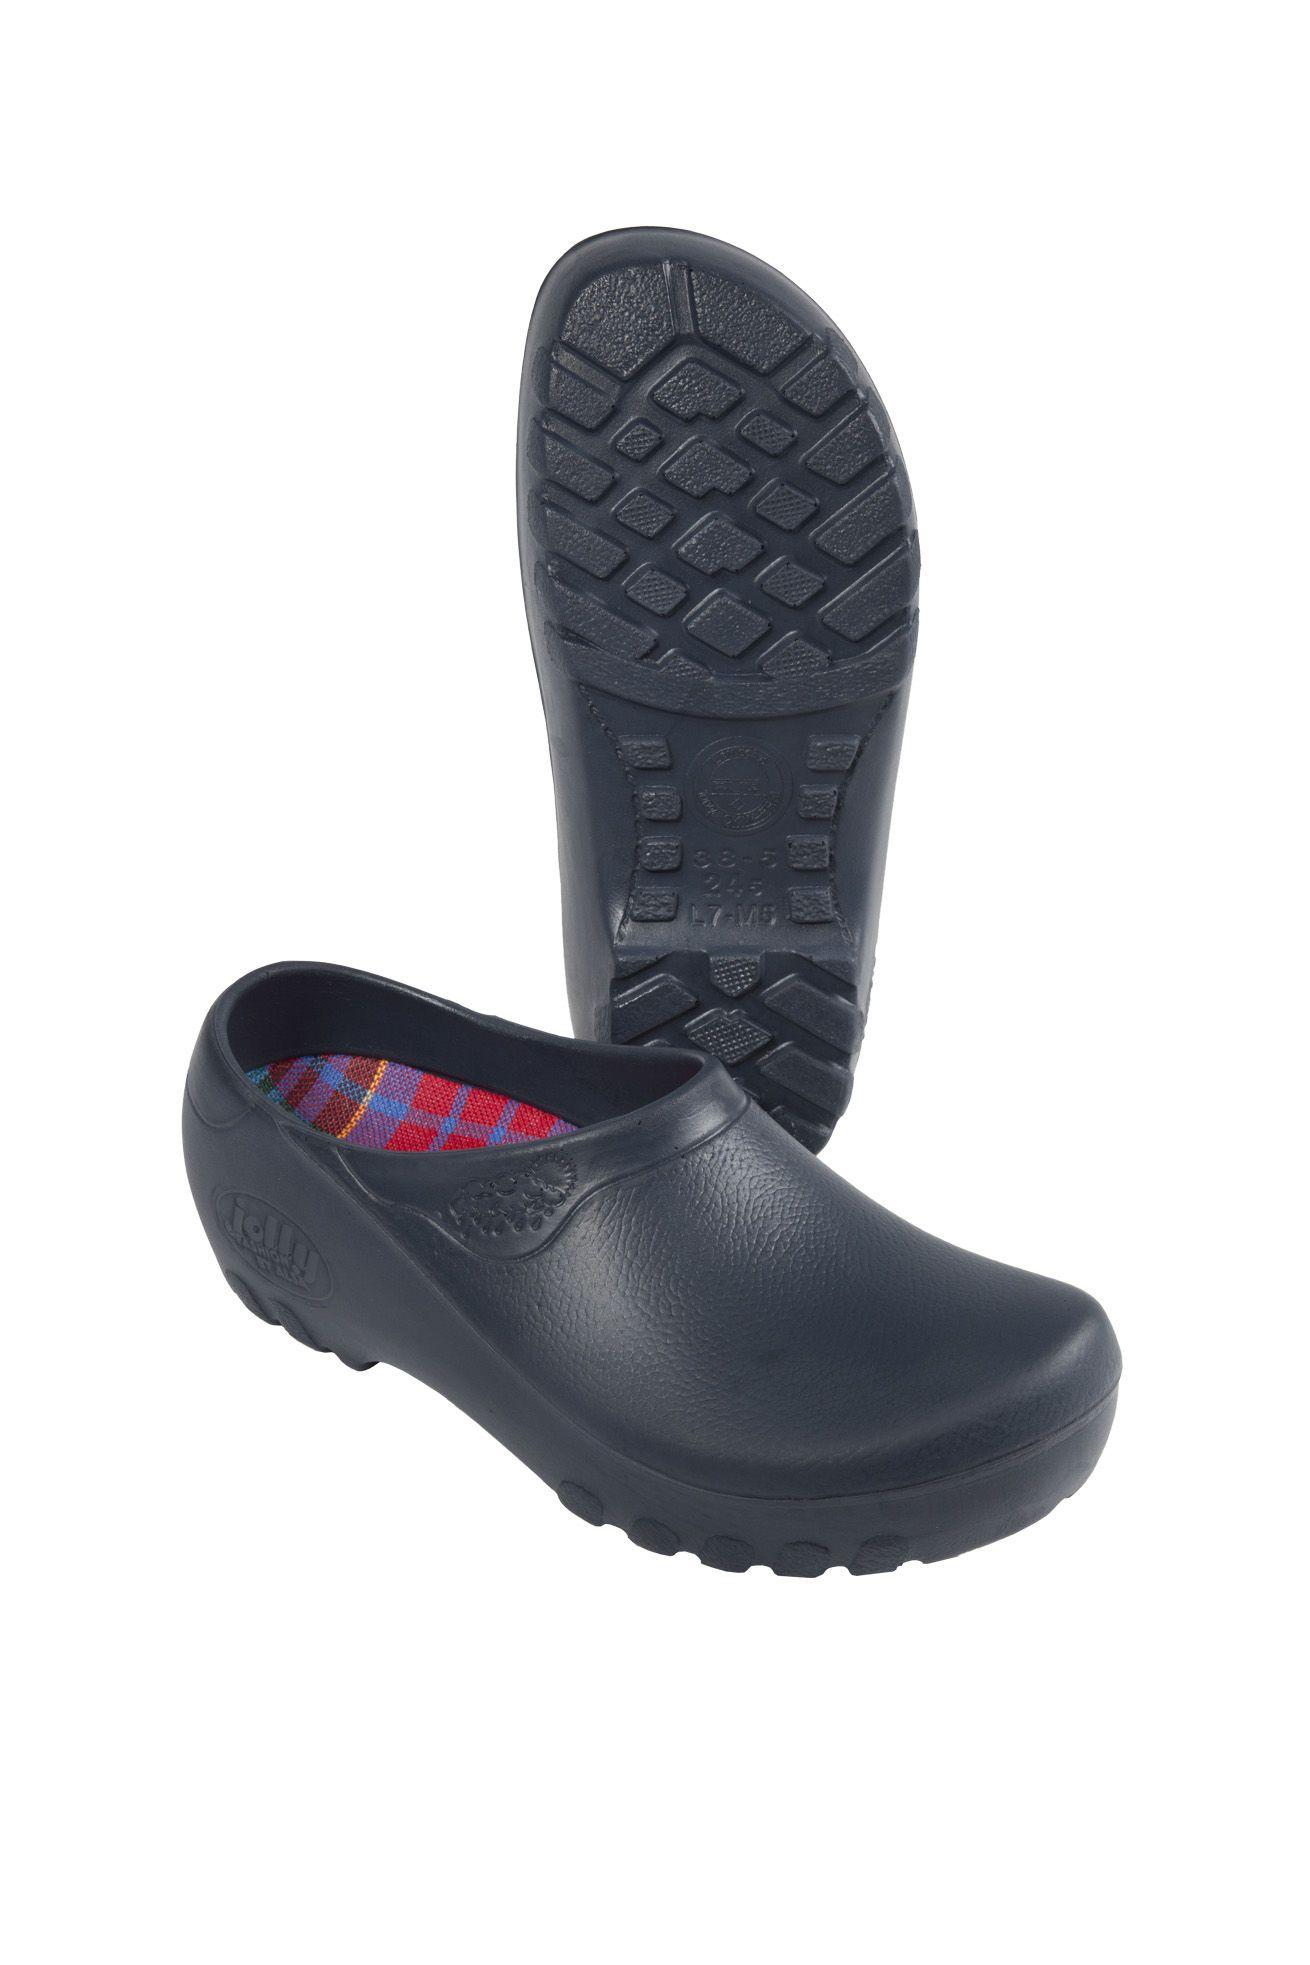 Garden Shoes Women S Classic Garden Clogs Gardener S Supply